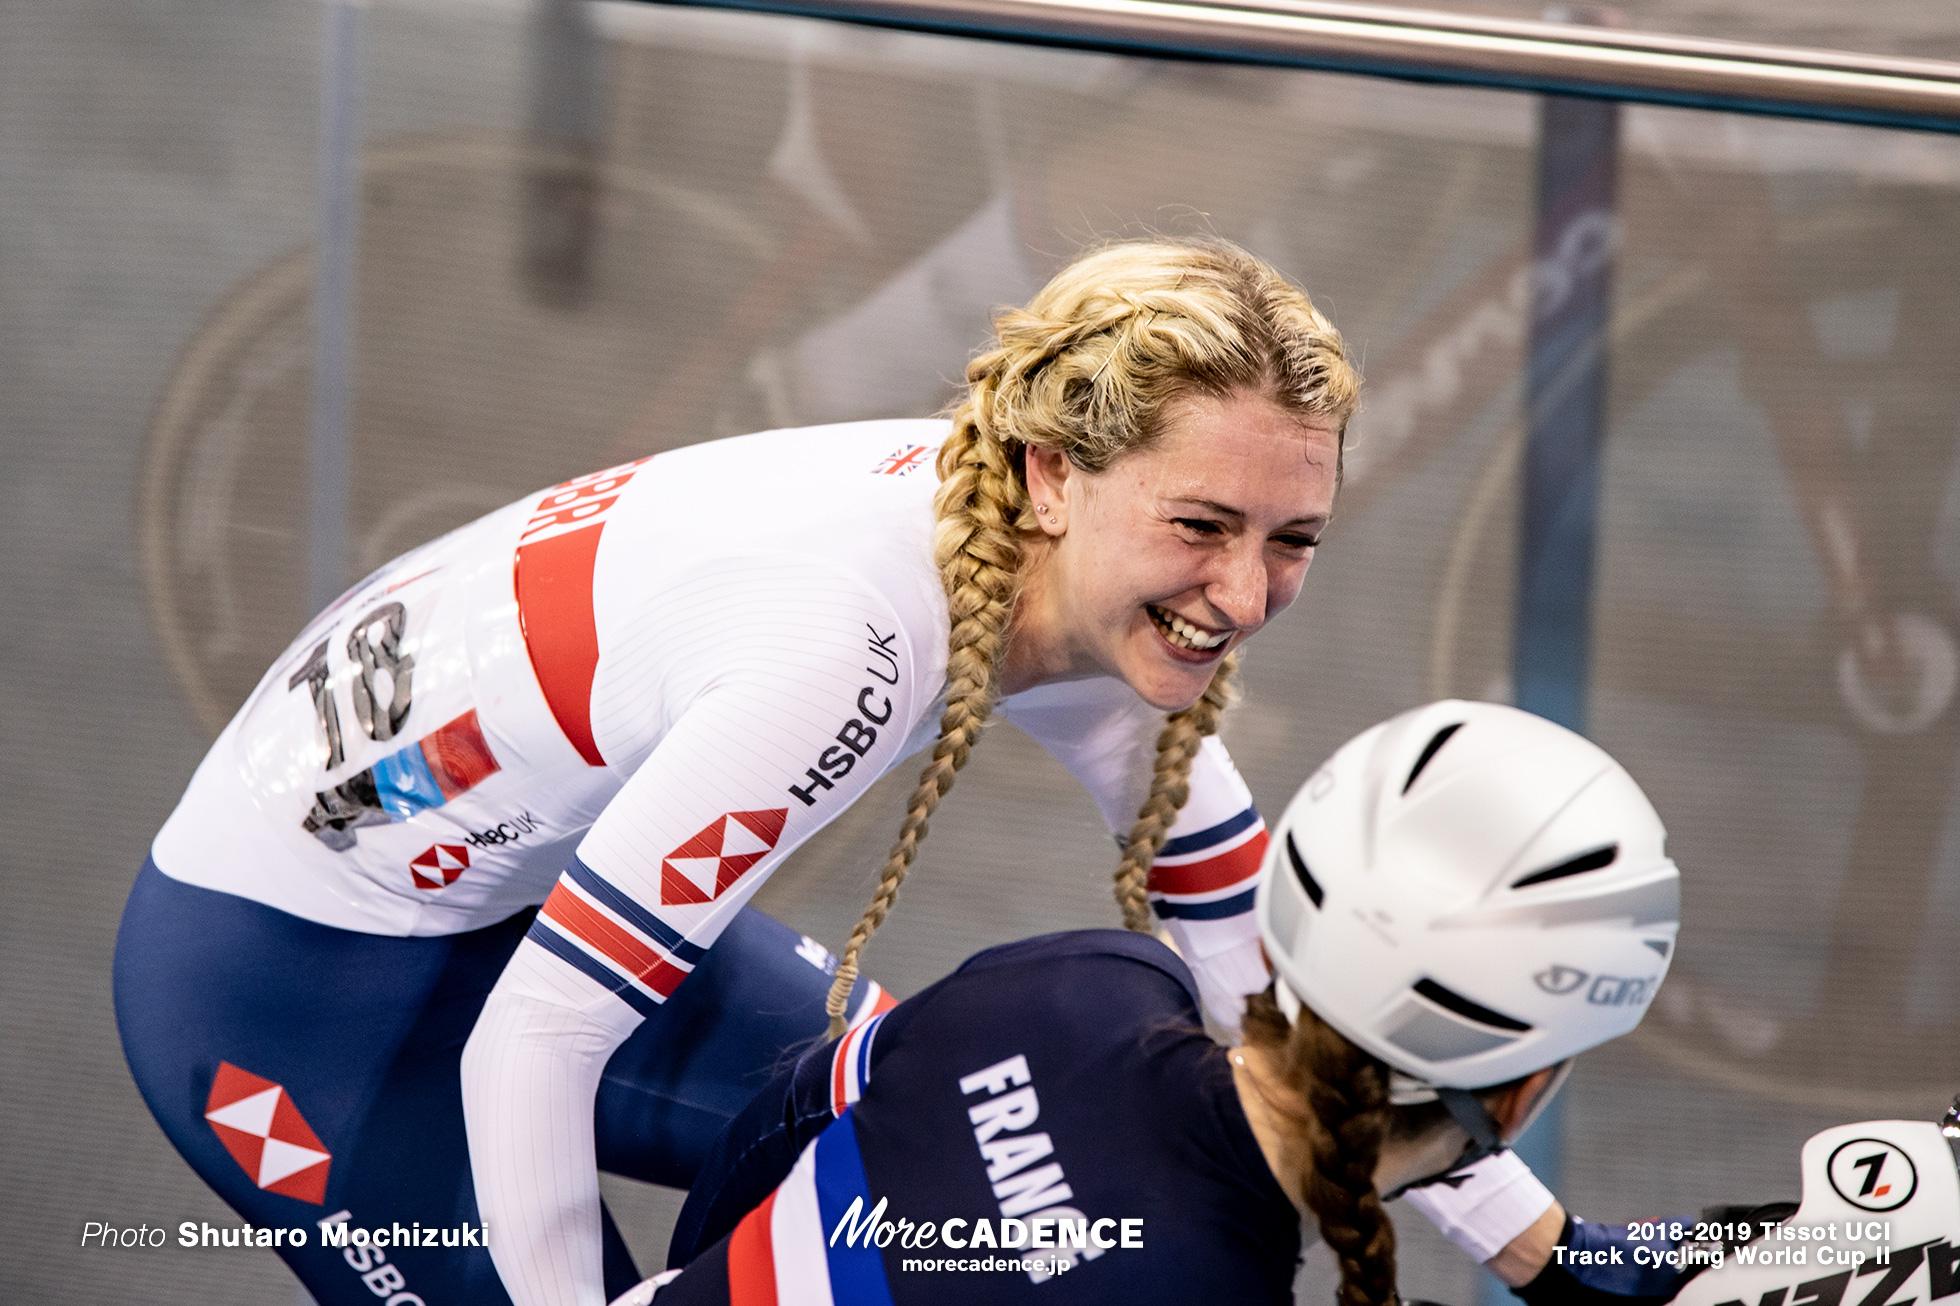 2018-2019 Tissot UCI Track Cycling World Cup II Women's Omnium I Point Race